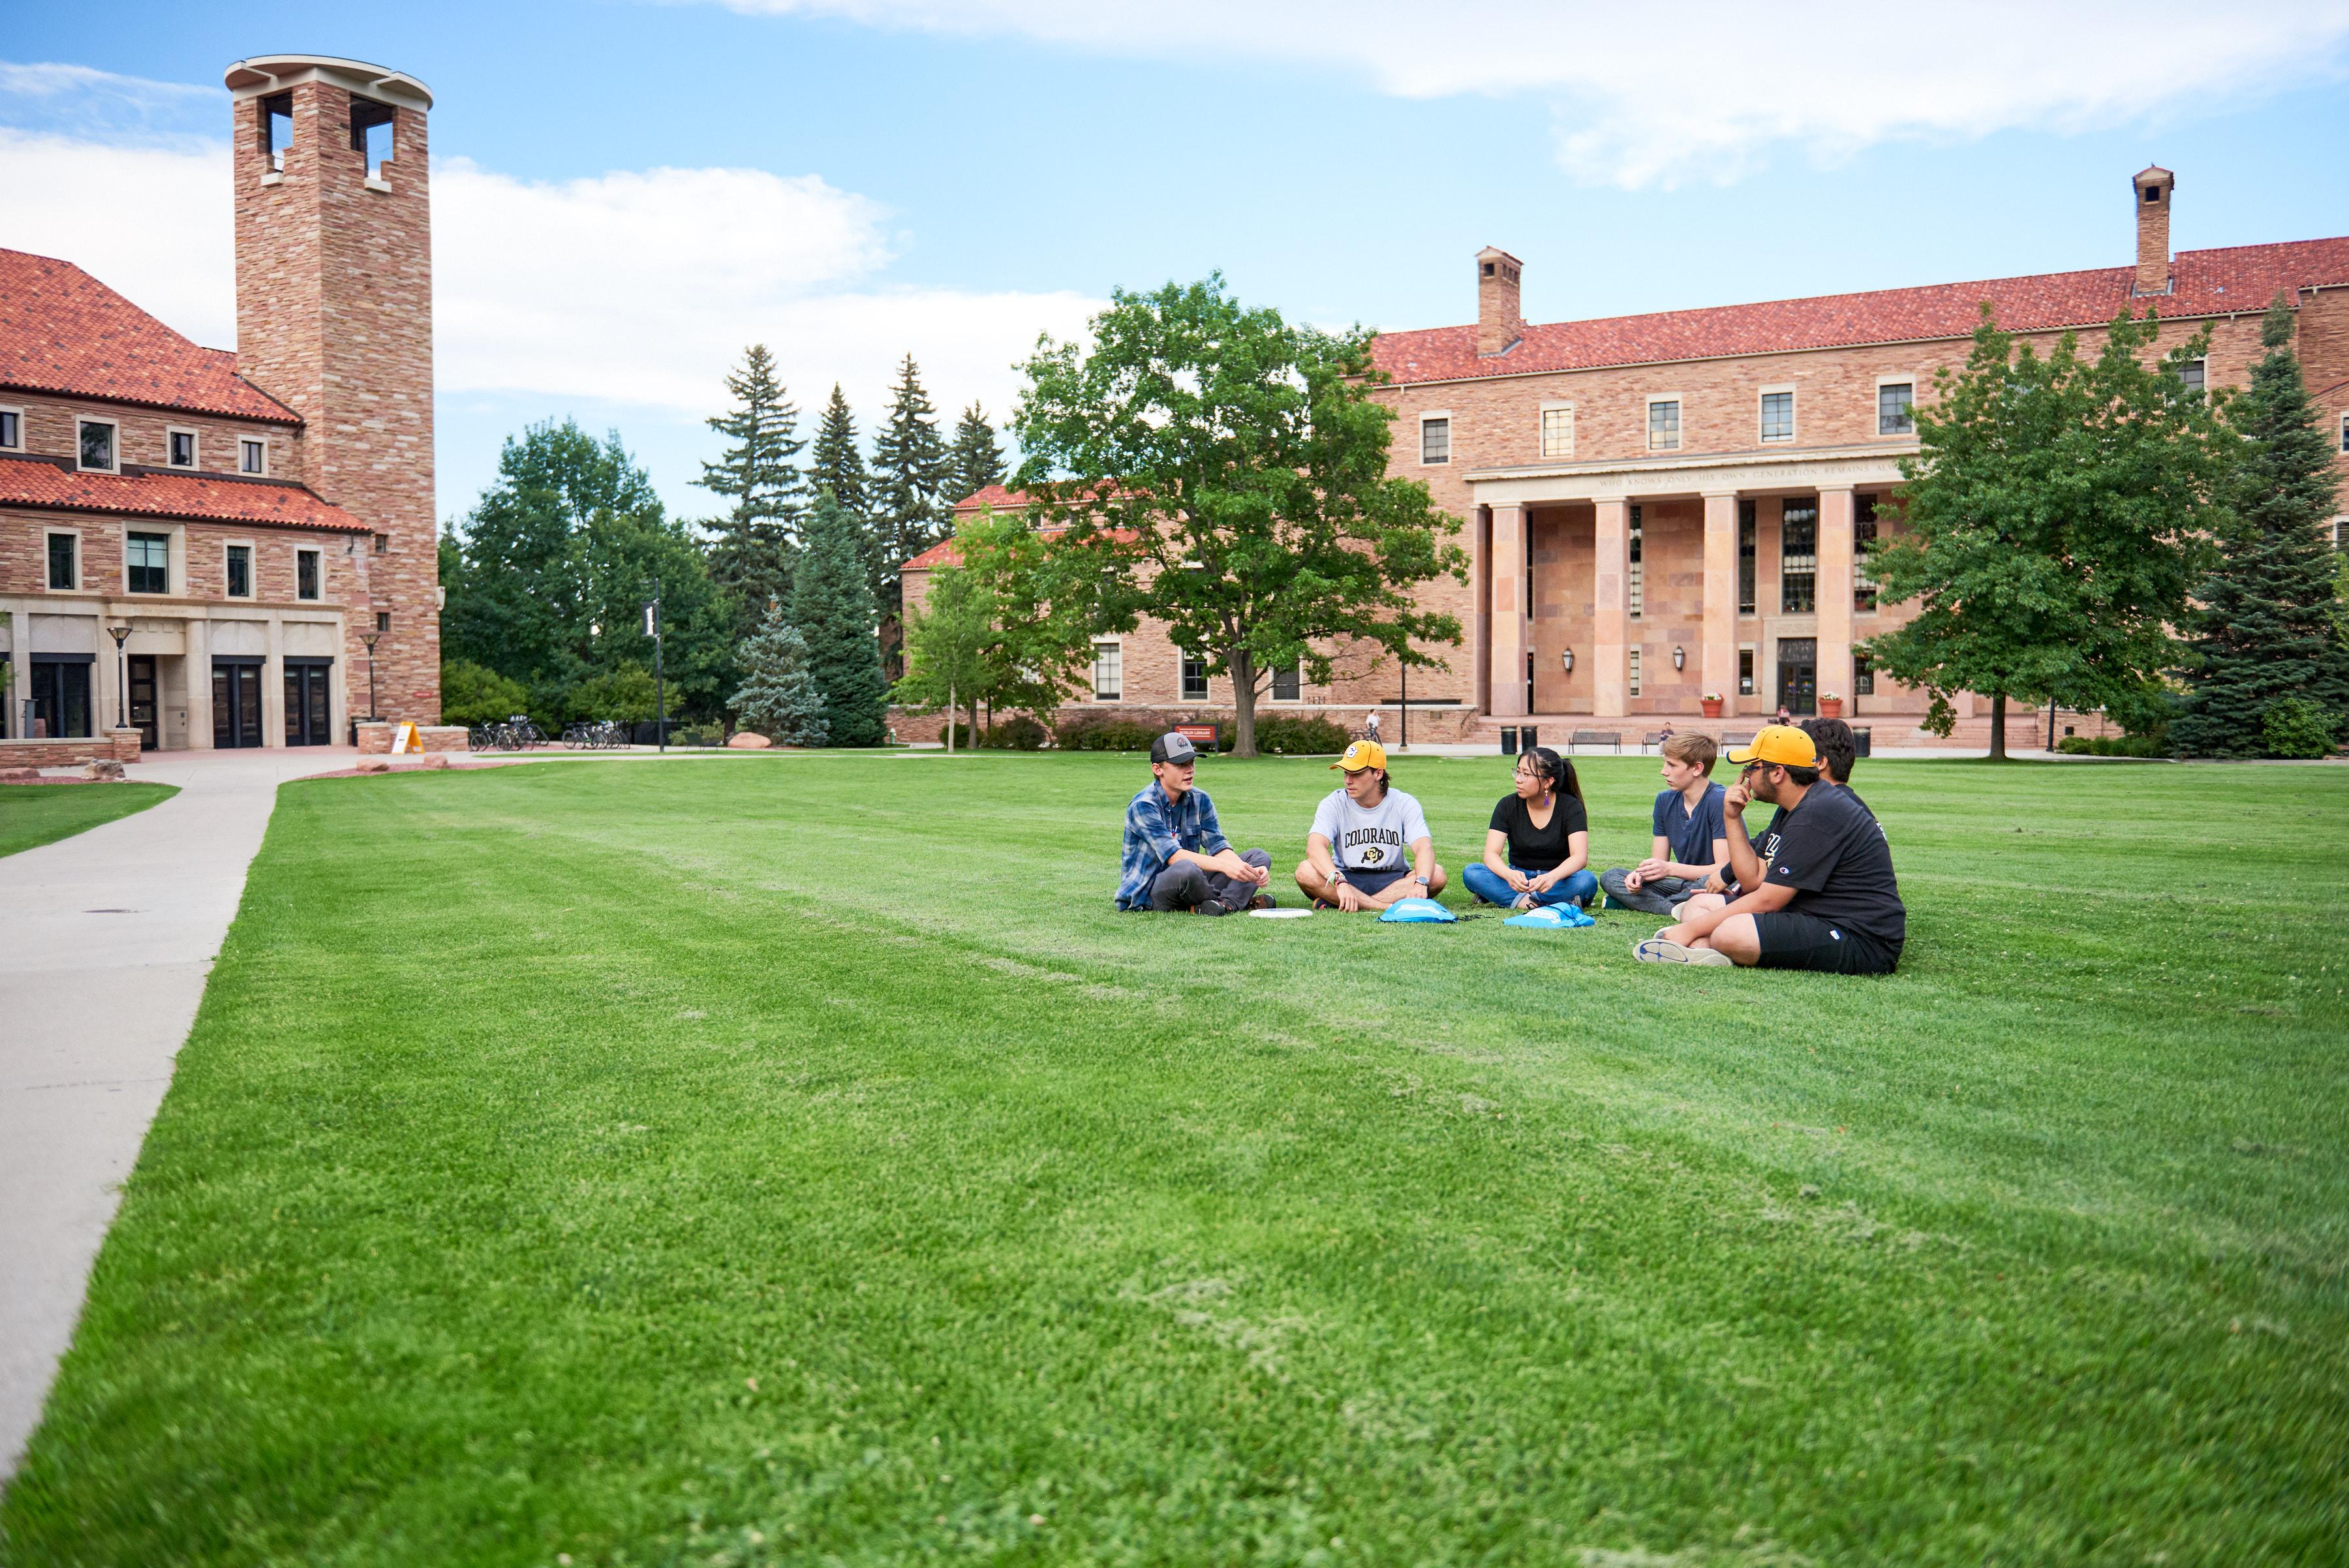 Summer Program - Computer Science | Summer Discovery: University of Colorado Boulder - STEM